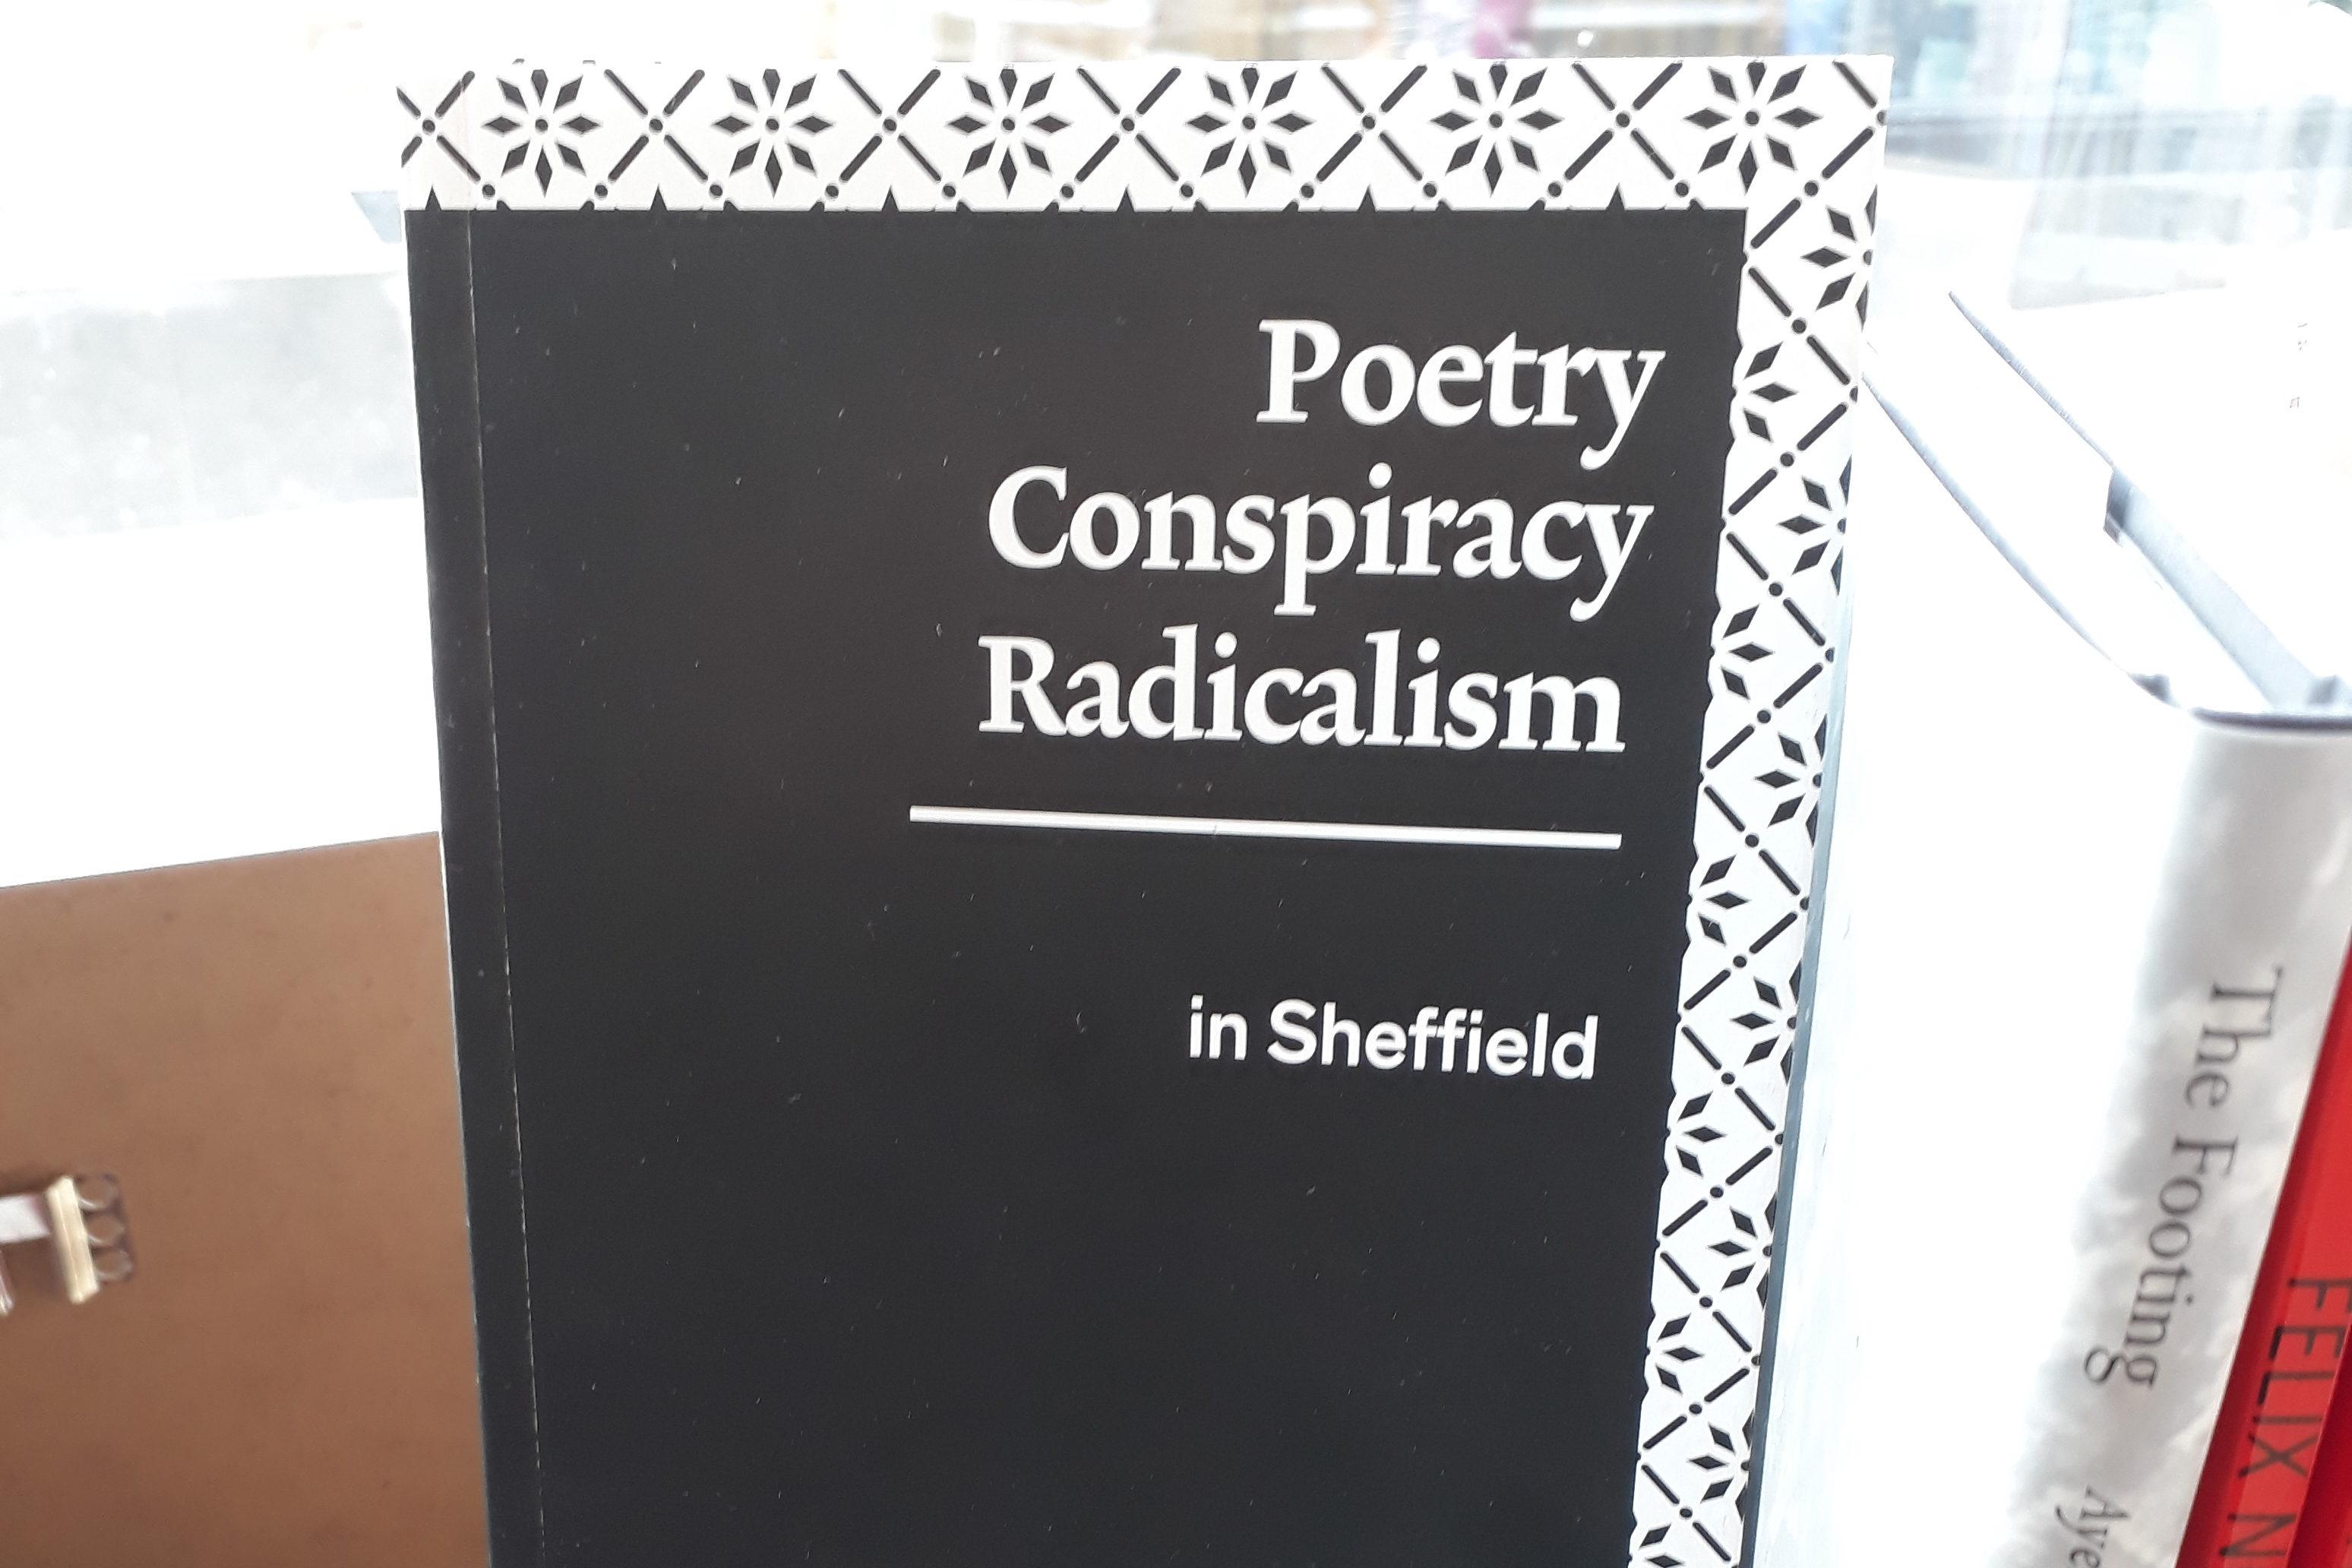 Poetry, Conspiracy, Radicalism